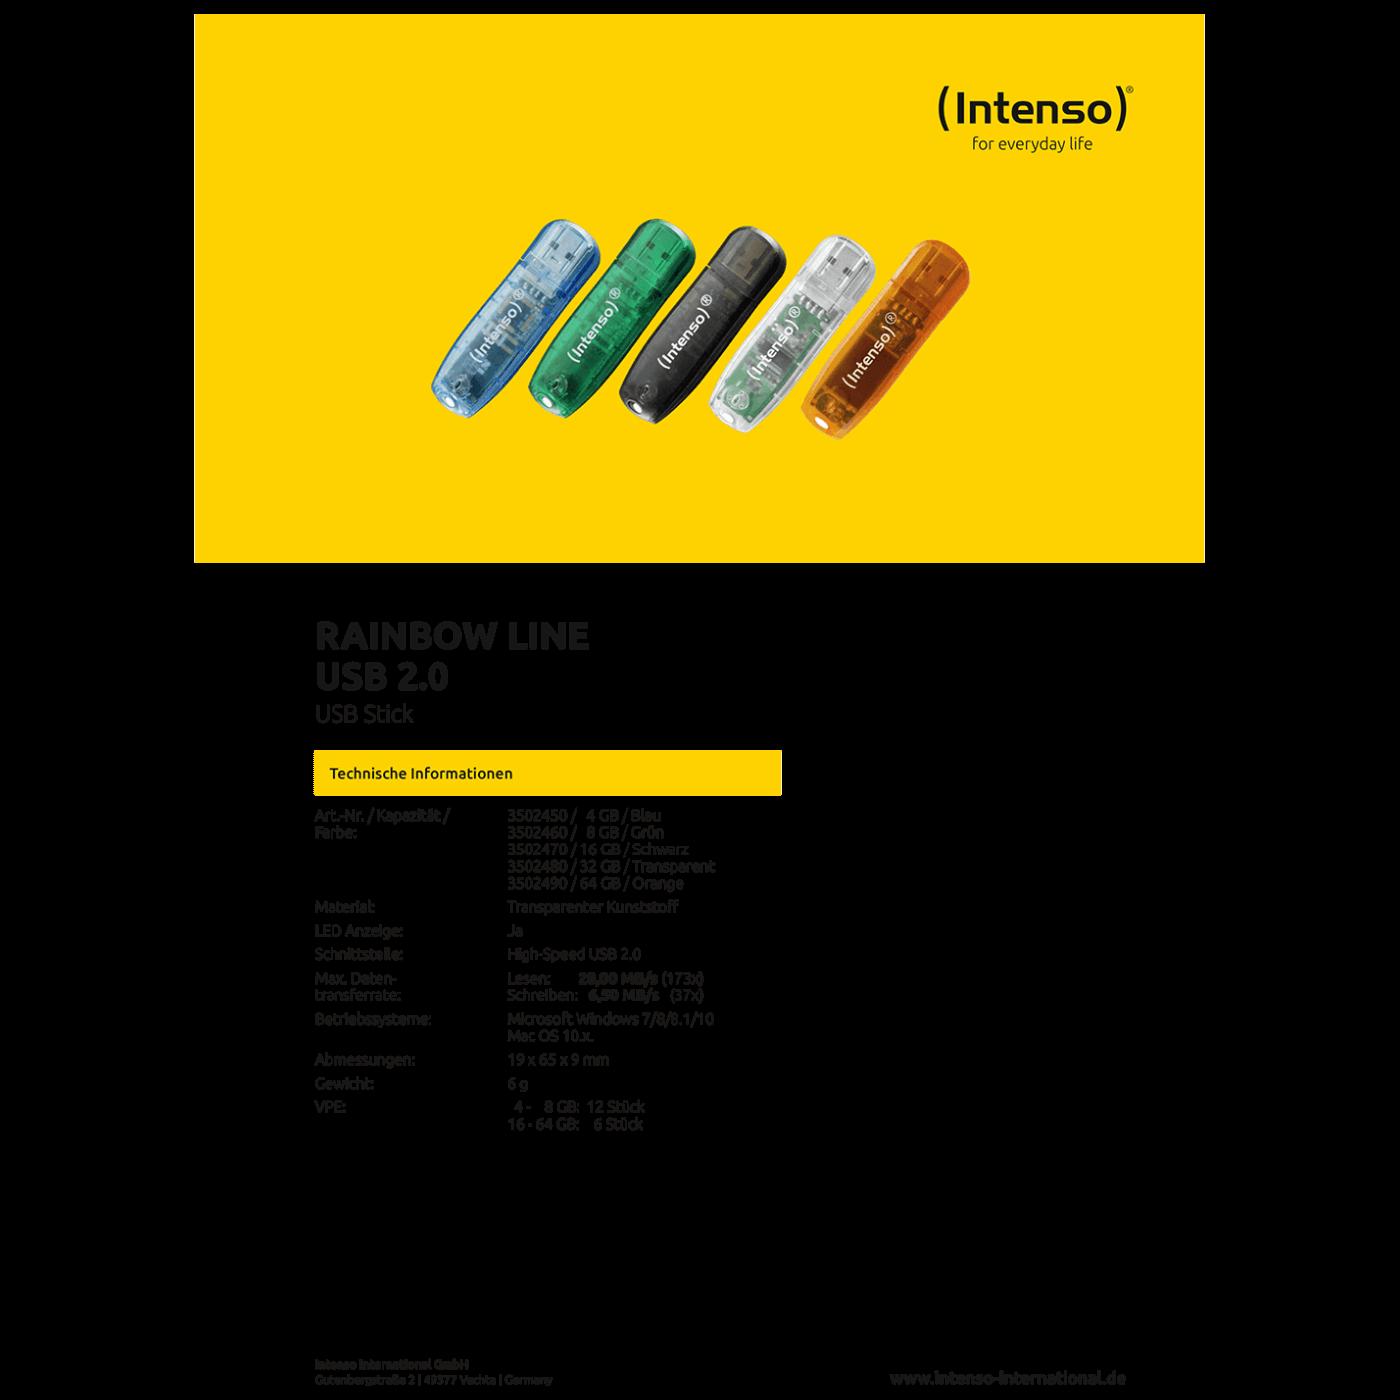 USB Flash drive 64GB Hi-Speed USB 2.0, Rainbow Line, ORANGE